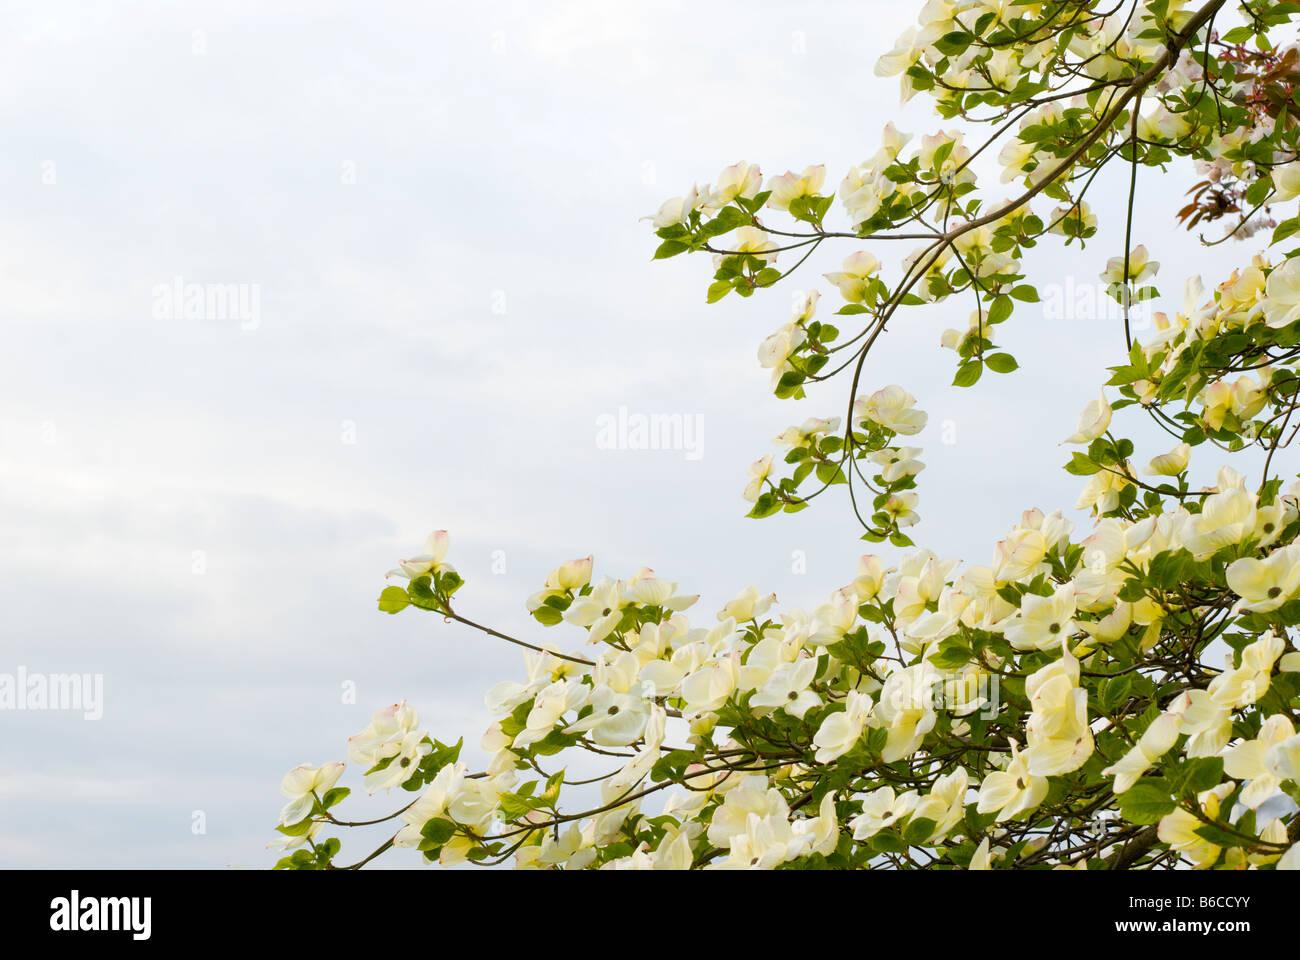 A Pacific Dogwood Cornus Nauttallii tree in full bloom British Columbia Canada - Stock Image